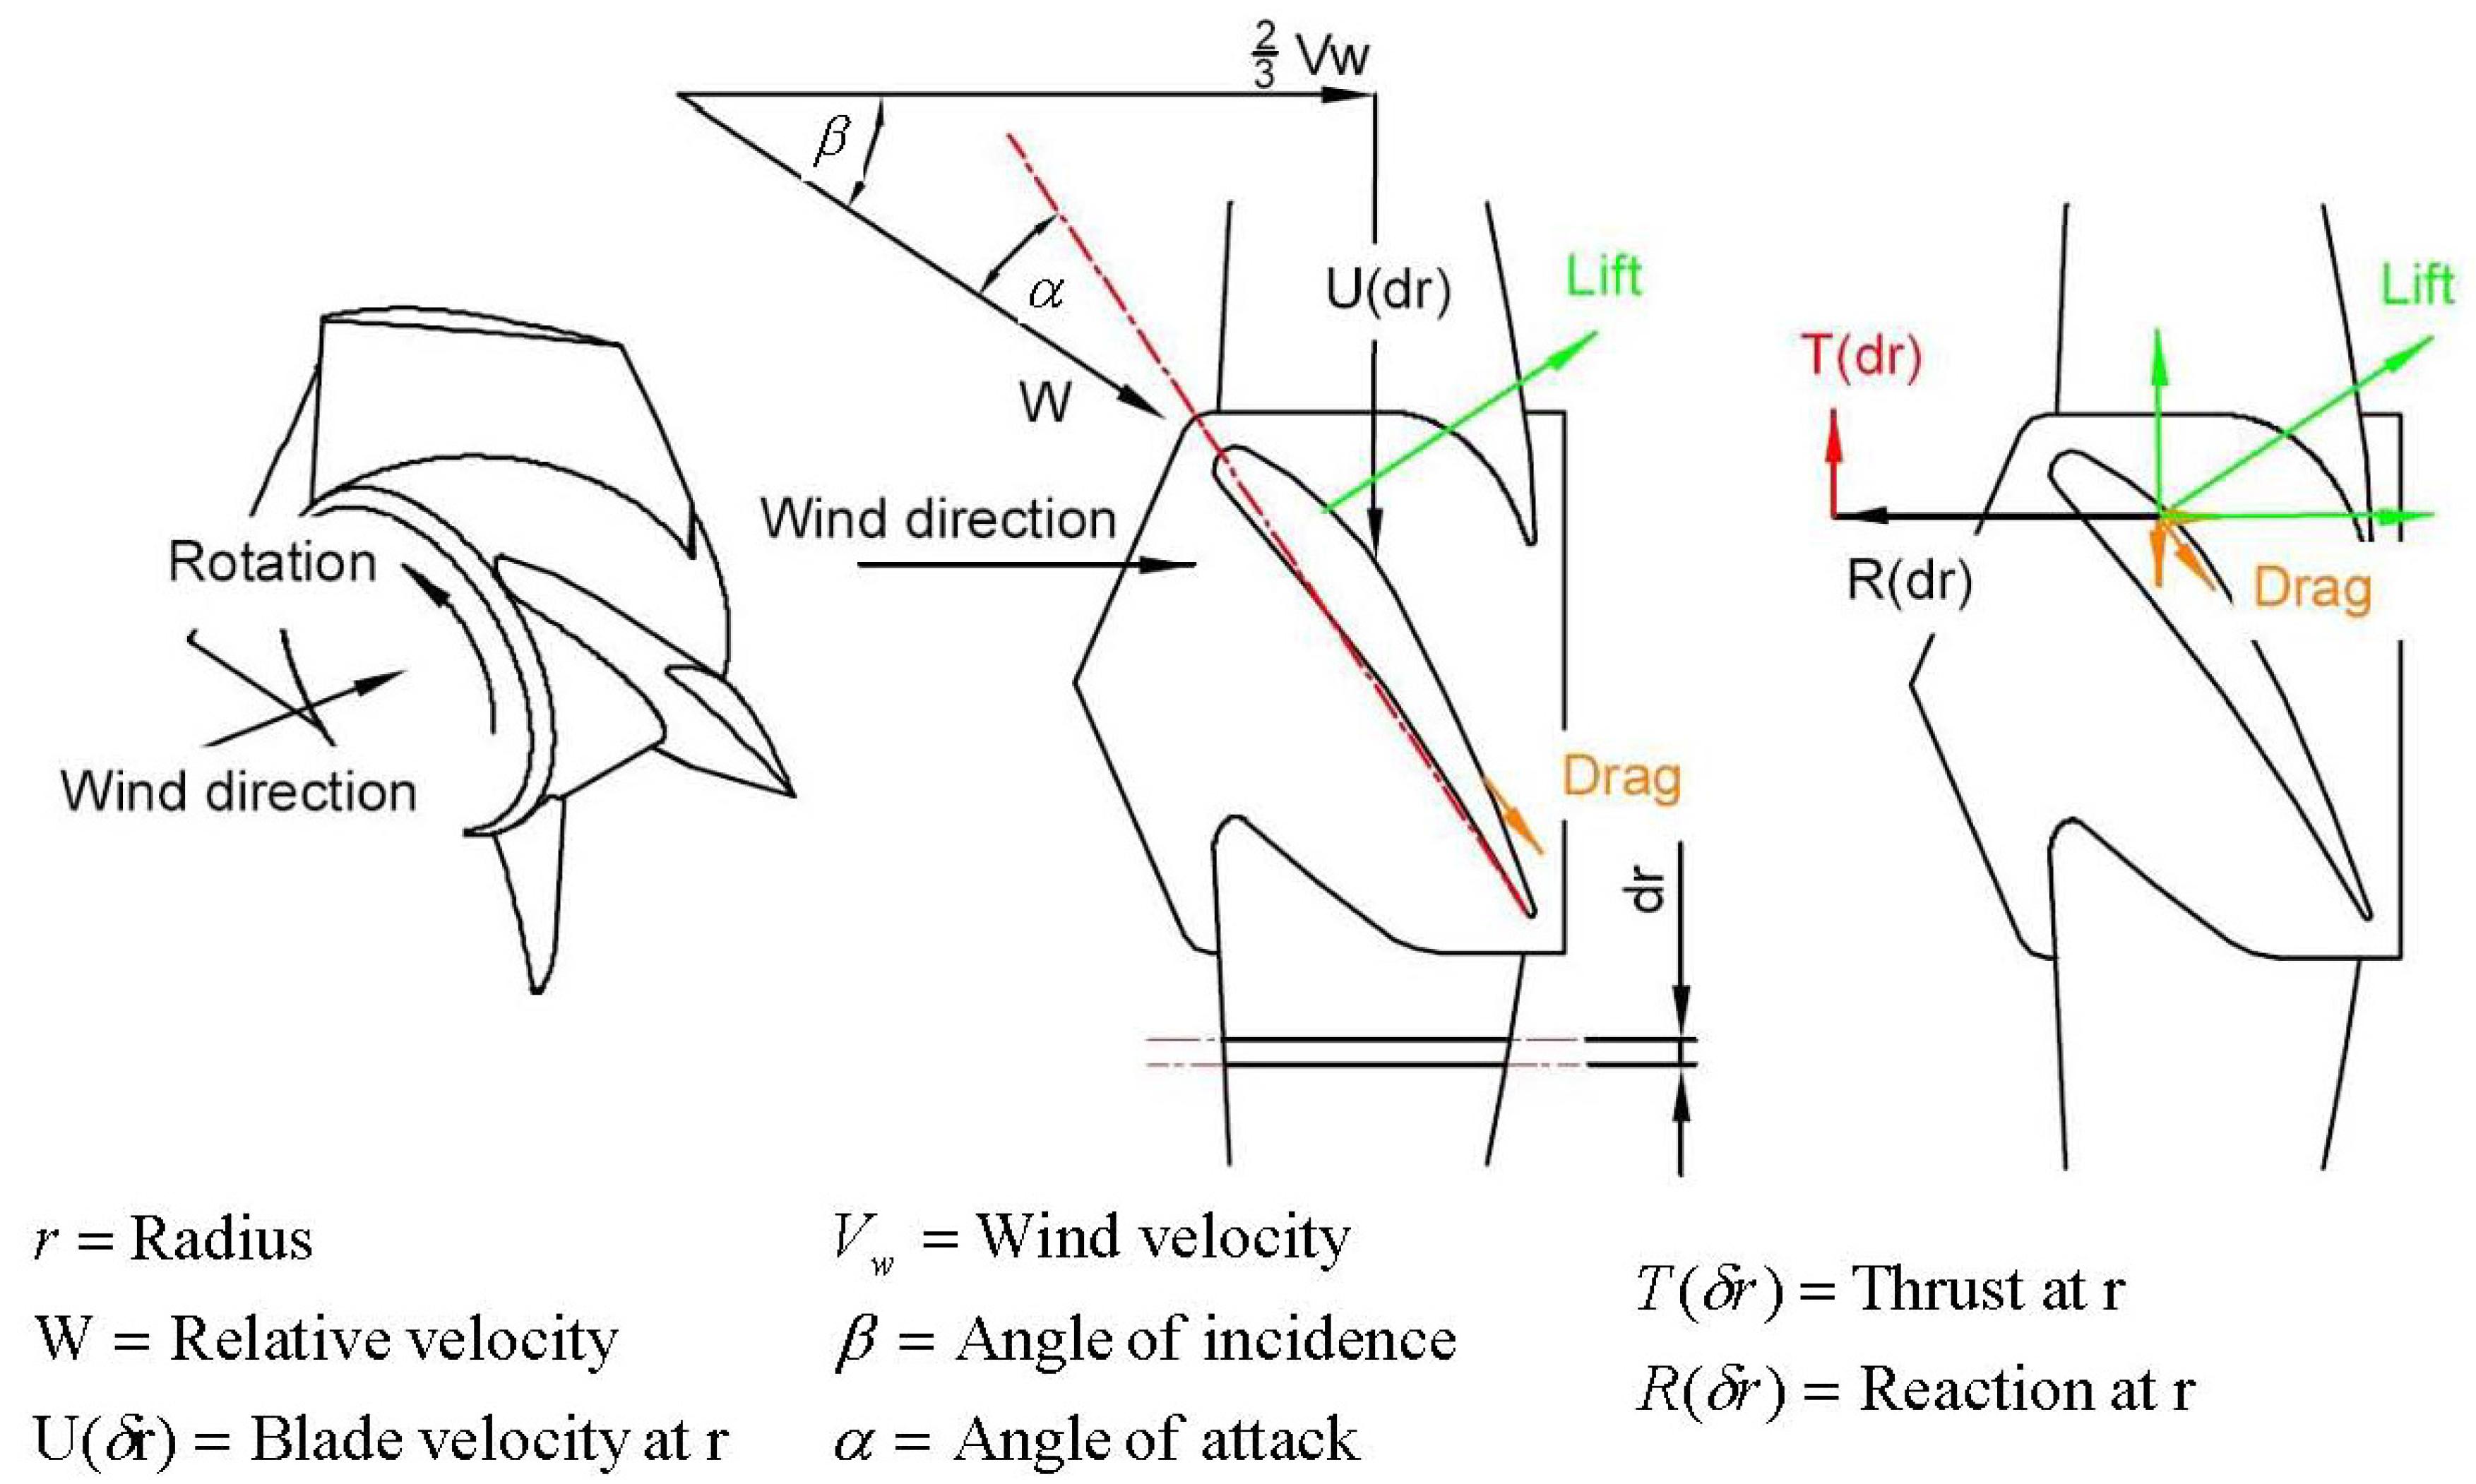 Energies Free Full Text Wind Turbine Blade Design